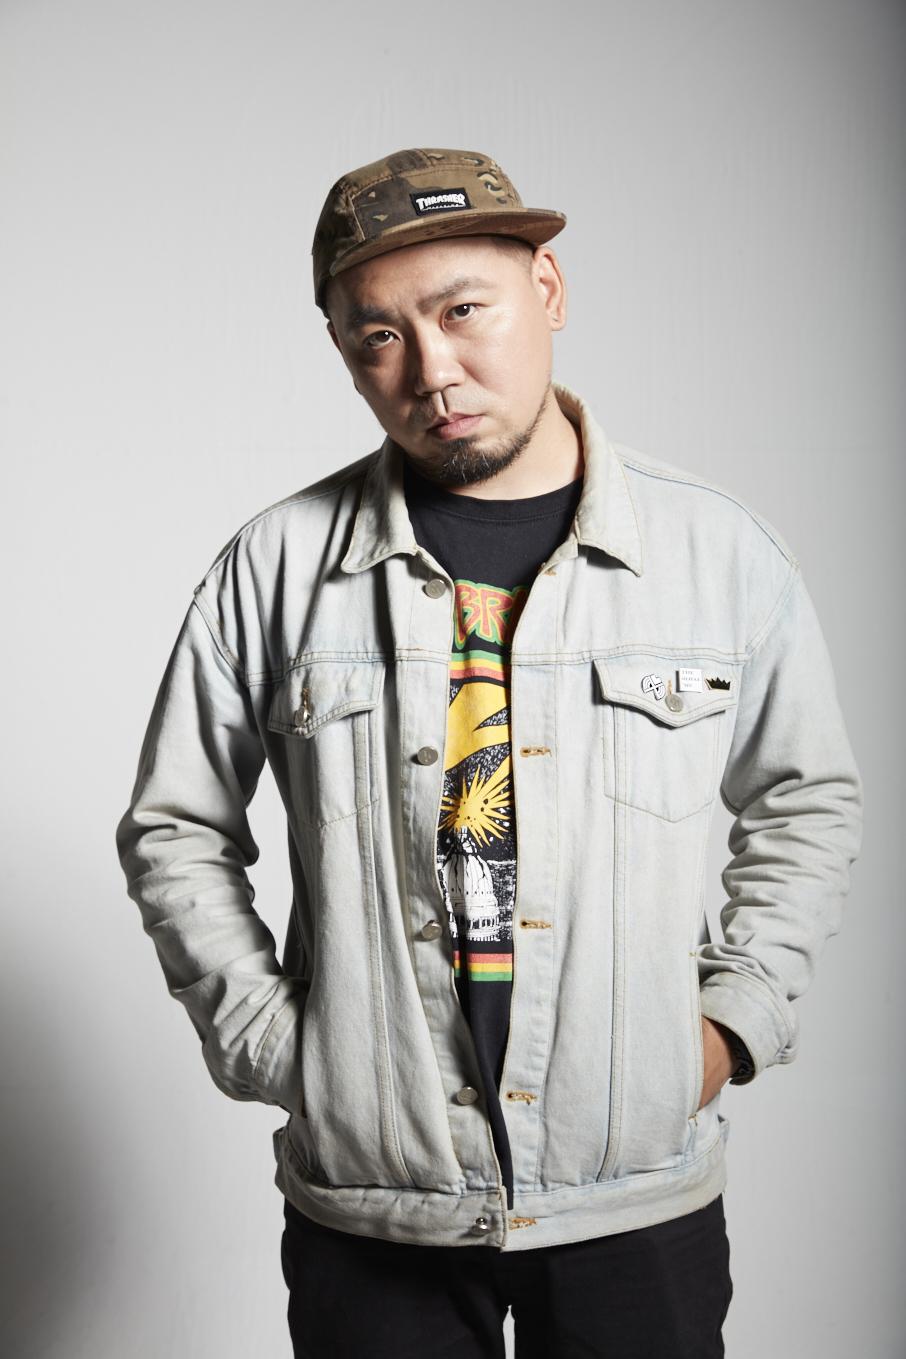 Korea photographer Manchul Kim,82.10.3721.0074, mckphoto@naver.com